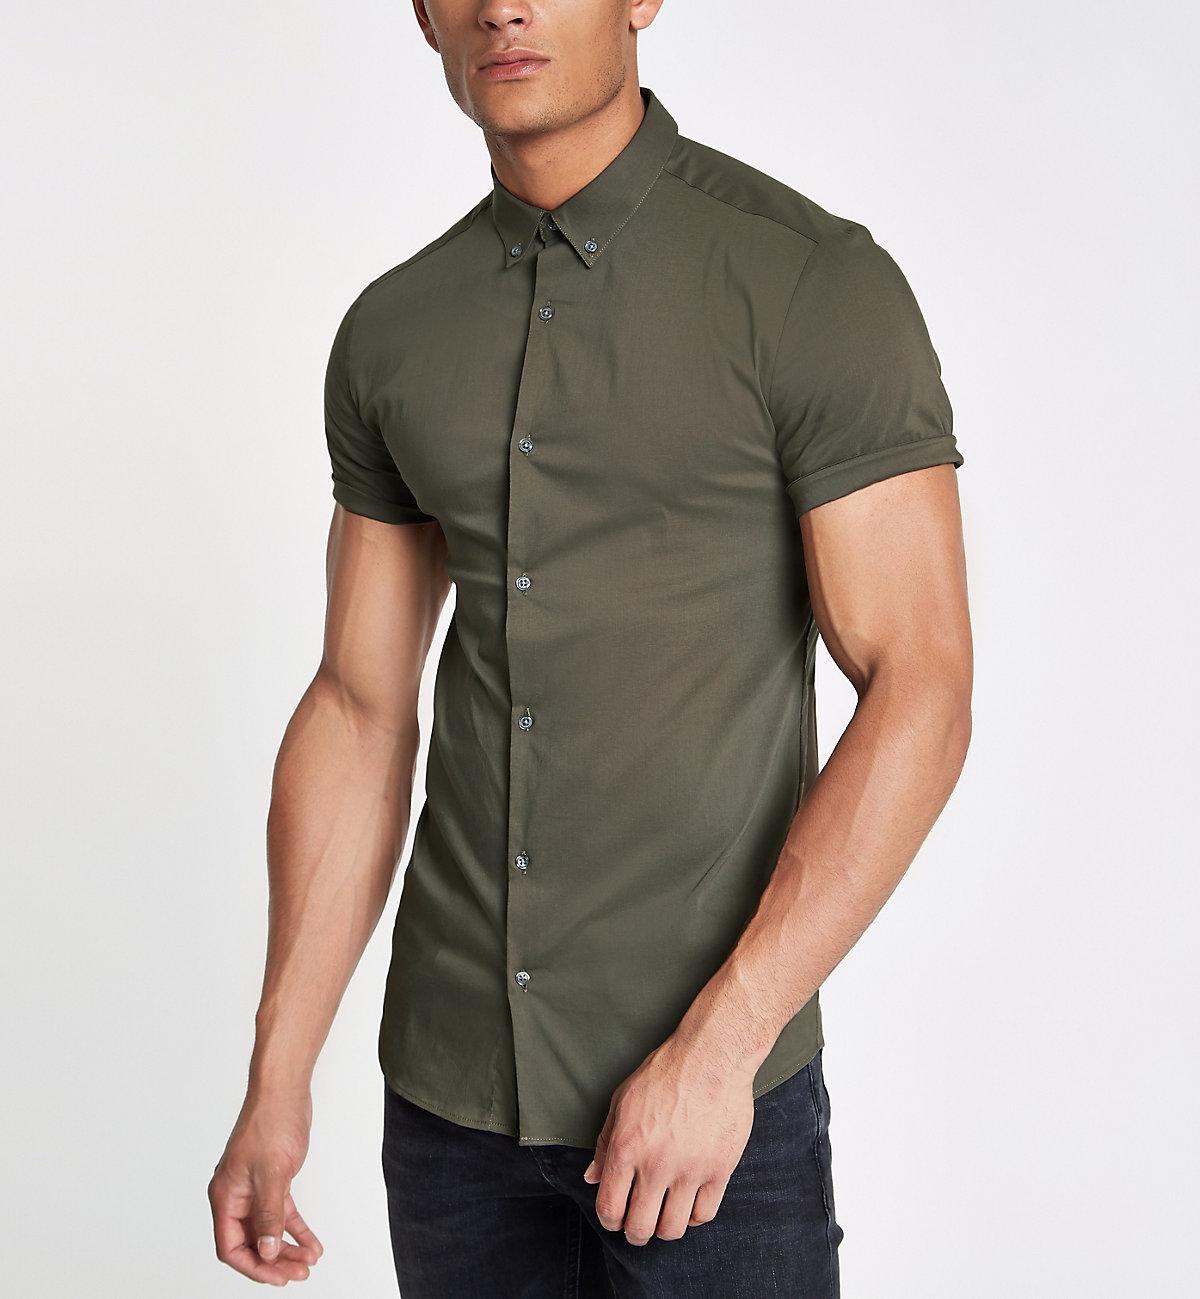 Green poplin muscle fit short sleeve shirt